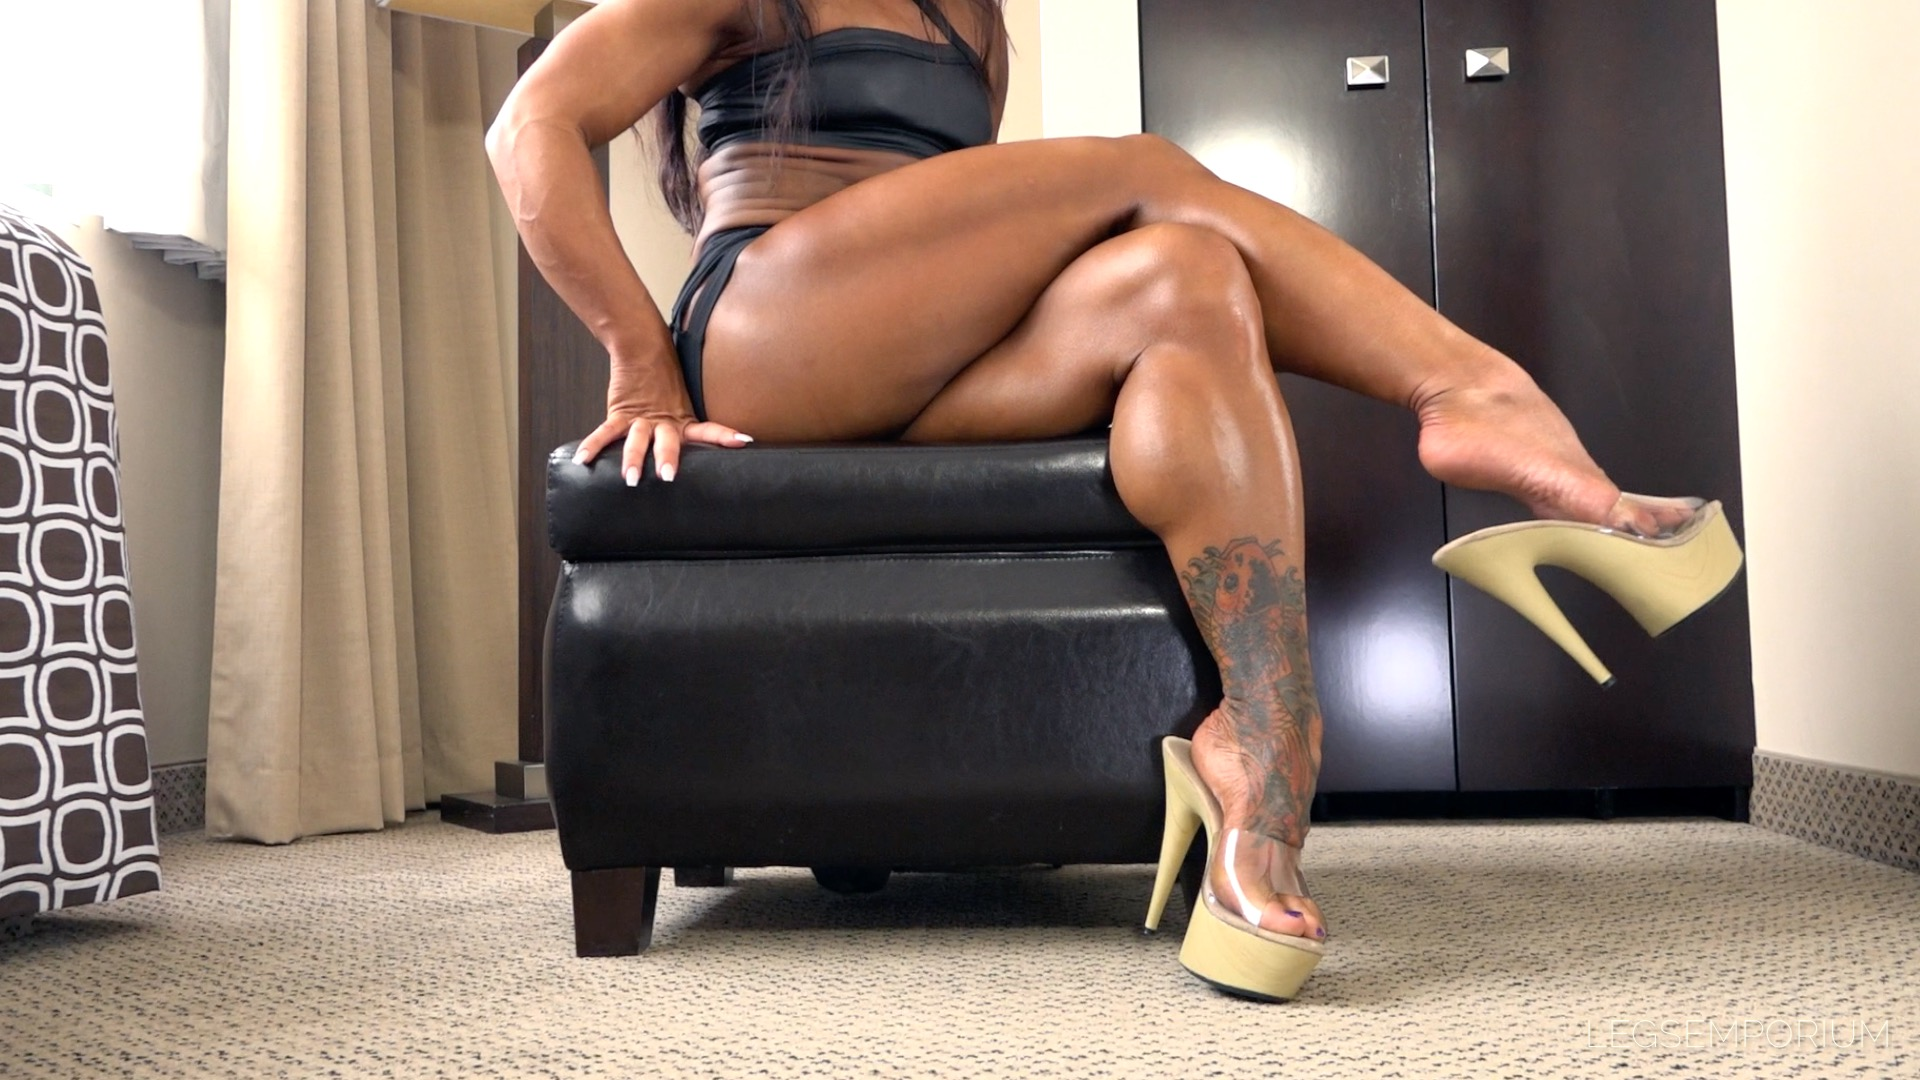 Akane Nigro - Muscular Calves Dangling 1  Legs Emporium-8126